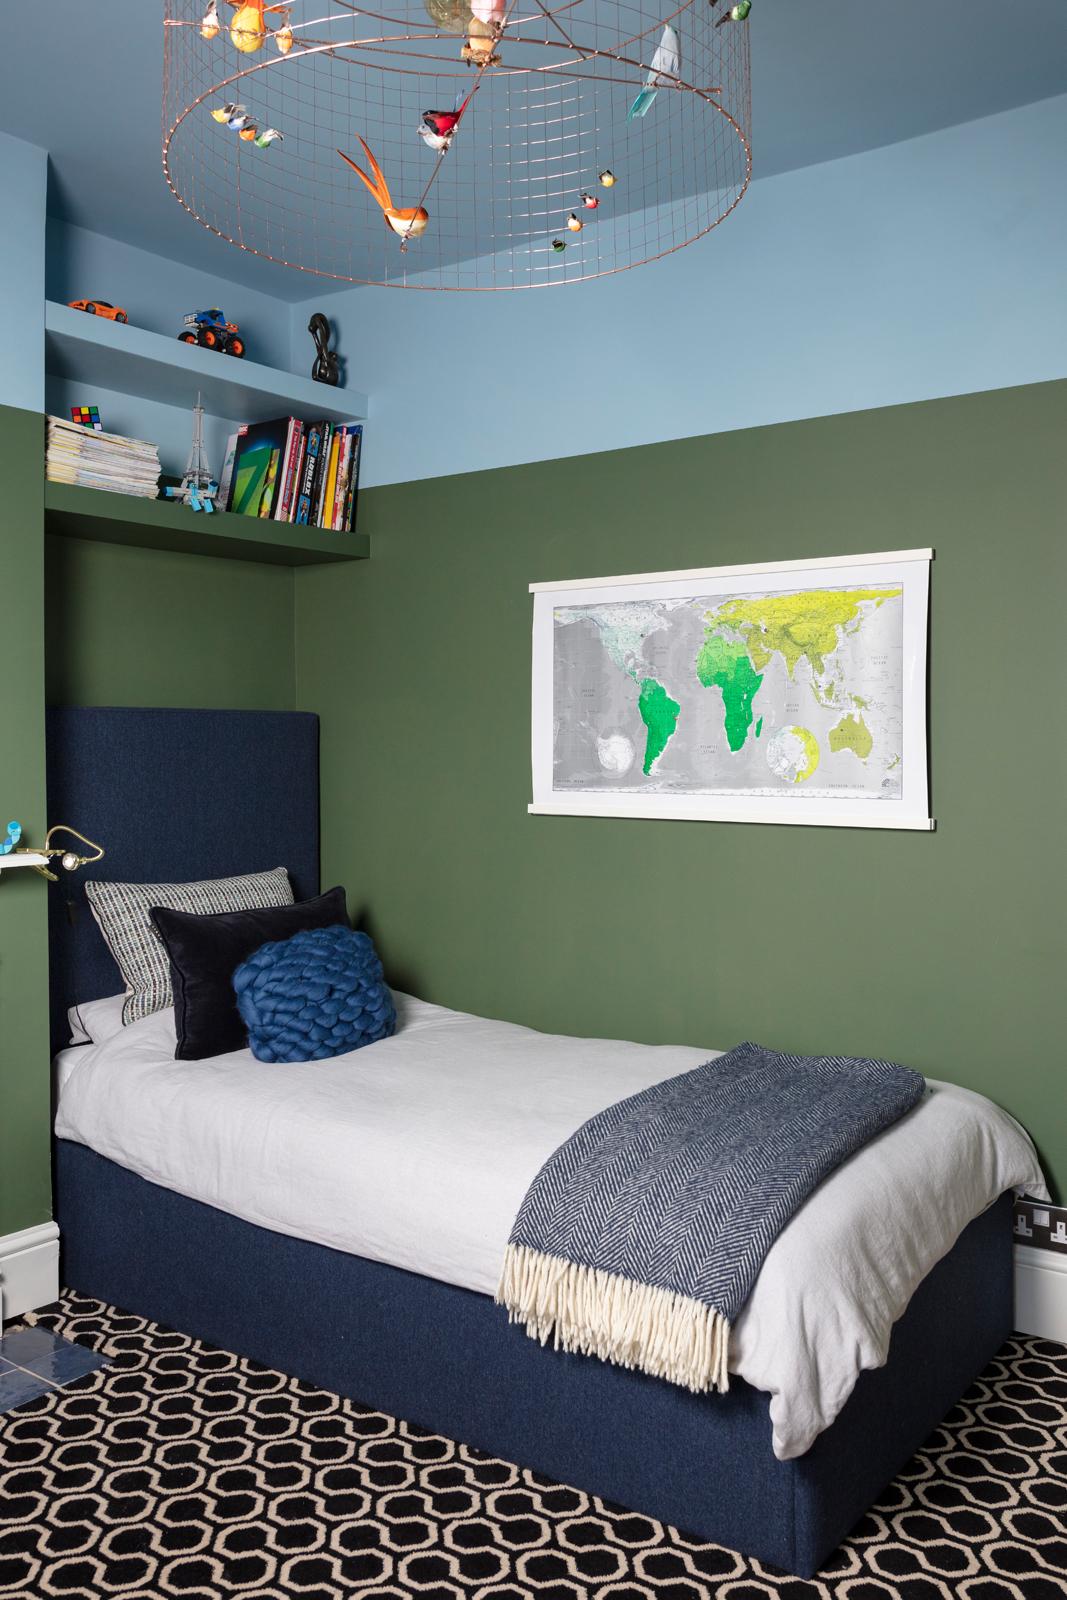 Beautiful dark blue Harlow single bed in Twilight wool marl from sofa.com